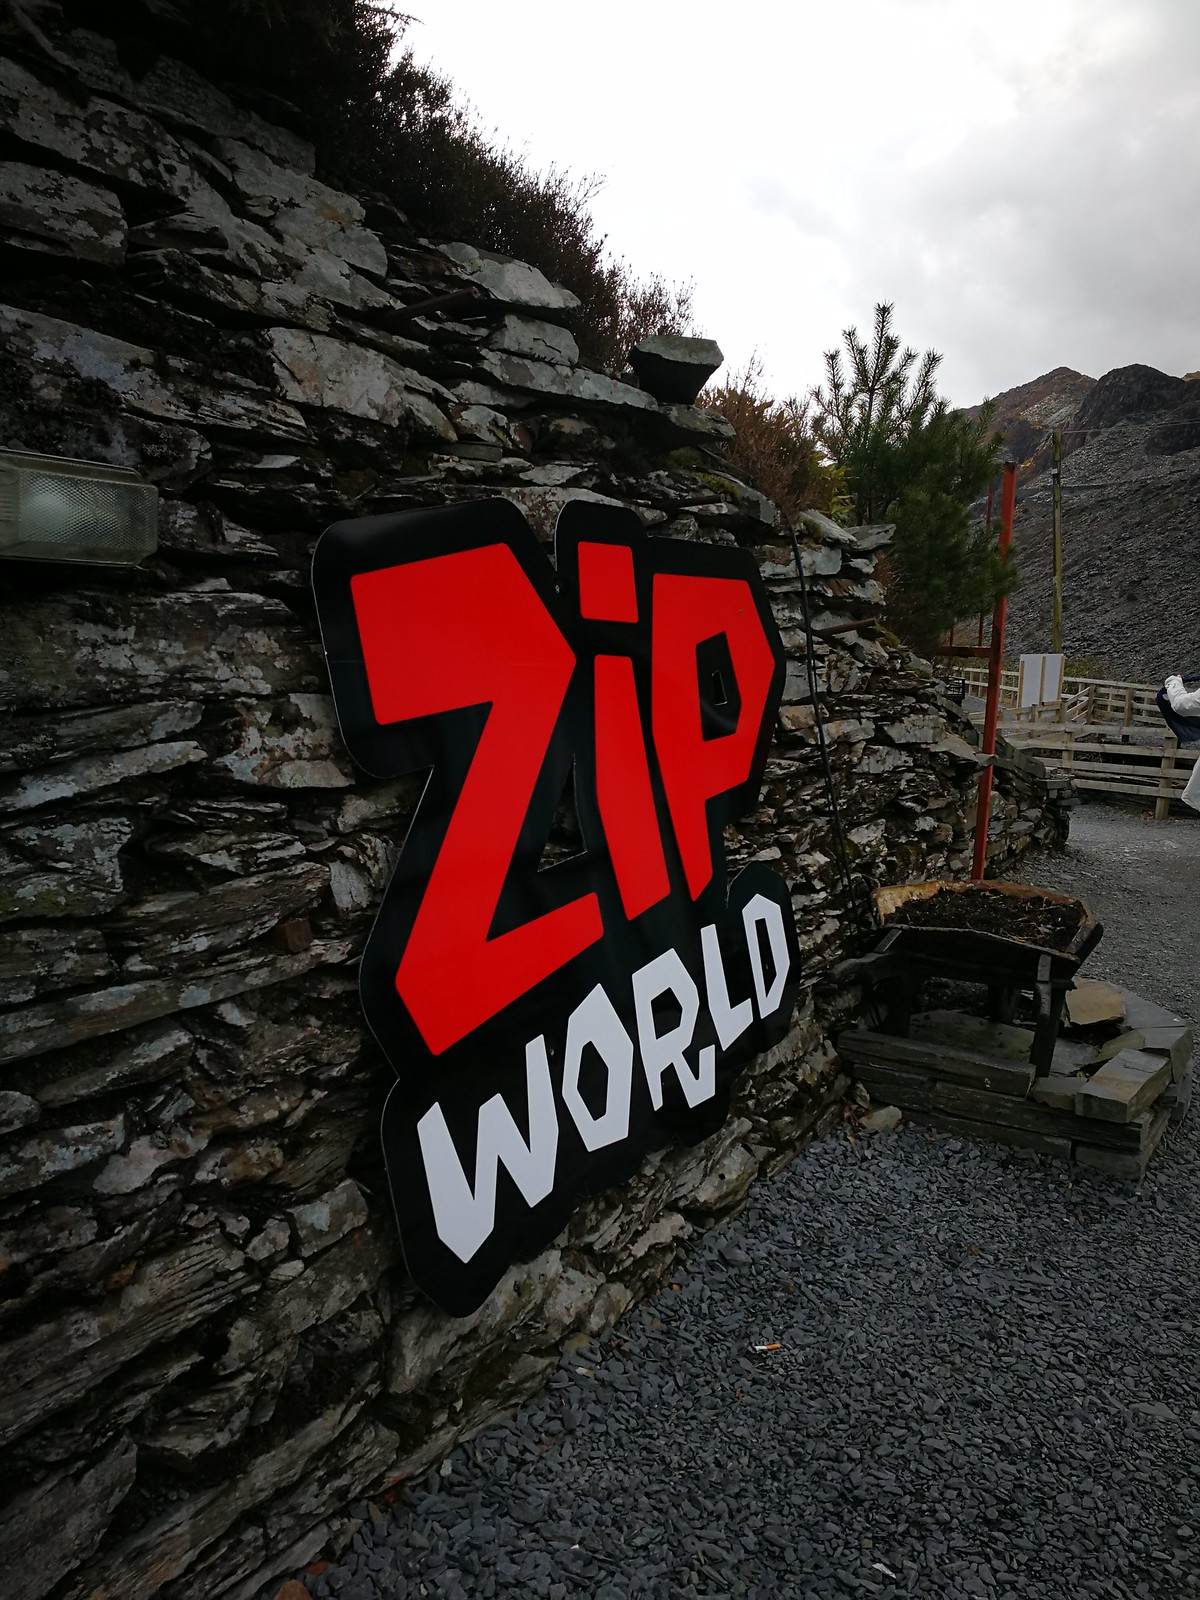 Snowdon Zip World